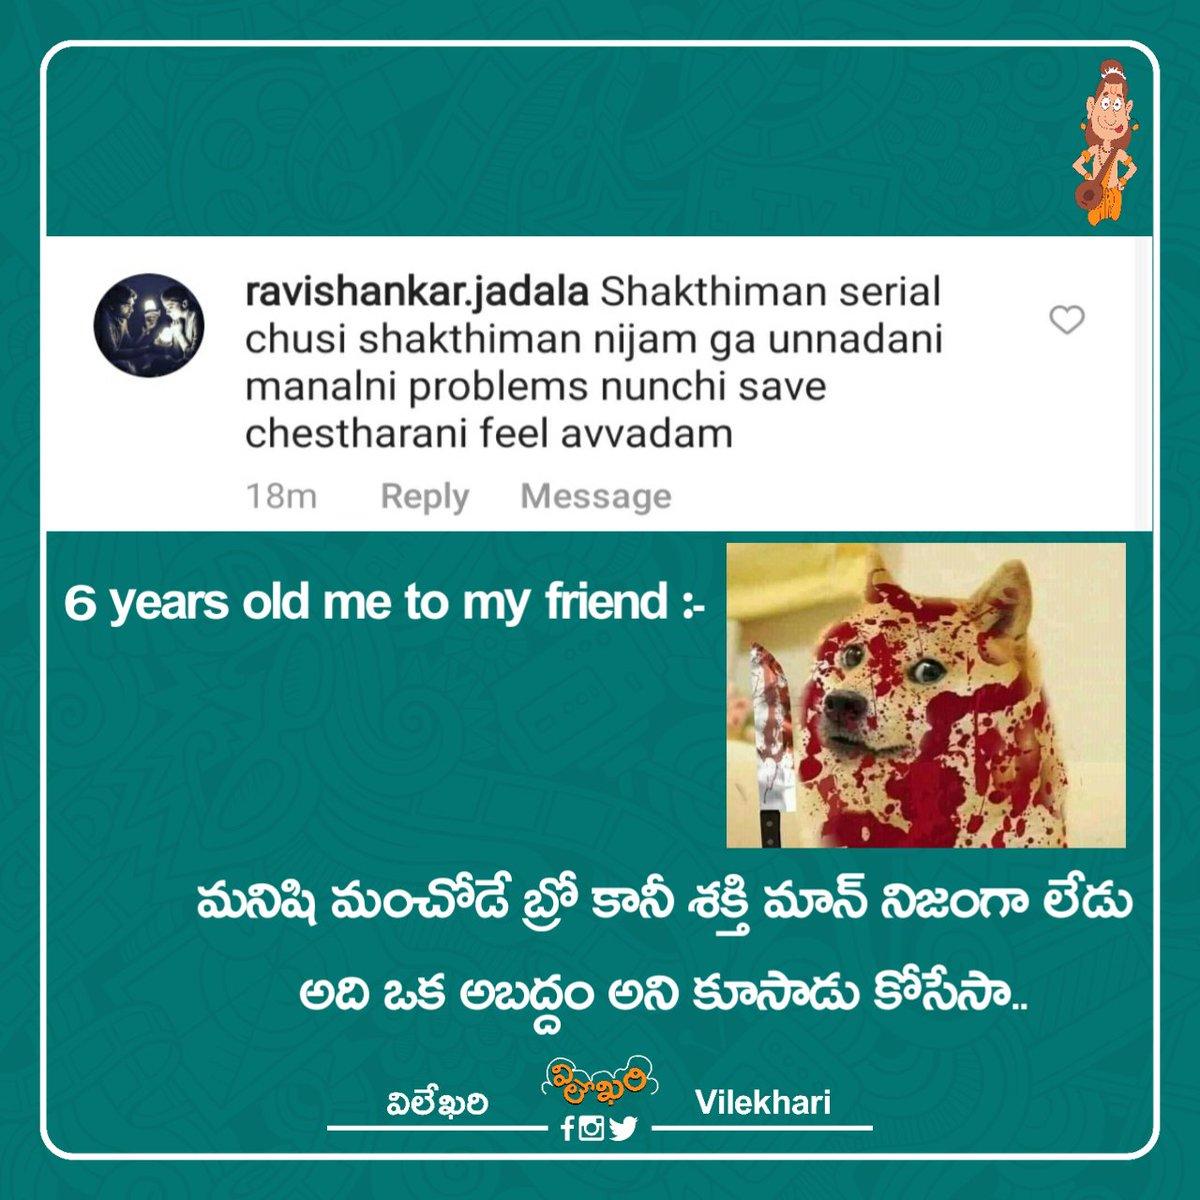 Shakthiman లేడు అంటాడు ఏంటండీ వాడు #VilekhariTelugu  Comments lo miku telisina lies and rumours ni mention Cheyandi..  #shakthiman #shakthimaan #friends #school  #telugu  #tollywood #andhrapradesh #telangana #viral #explore #explorepage #trending #trendingpageindia